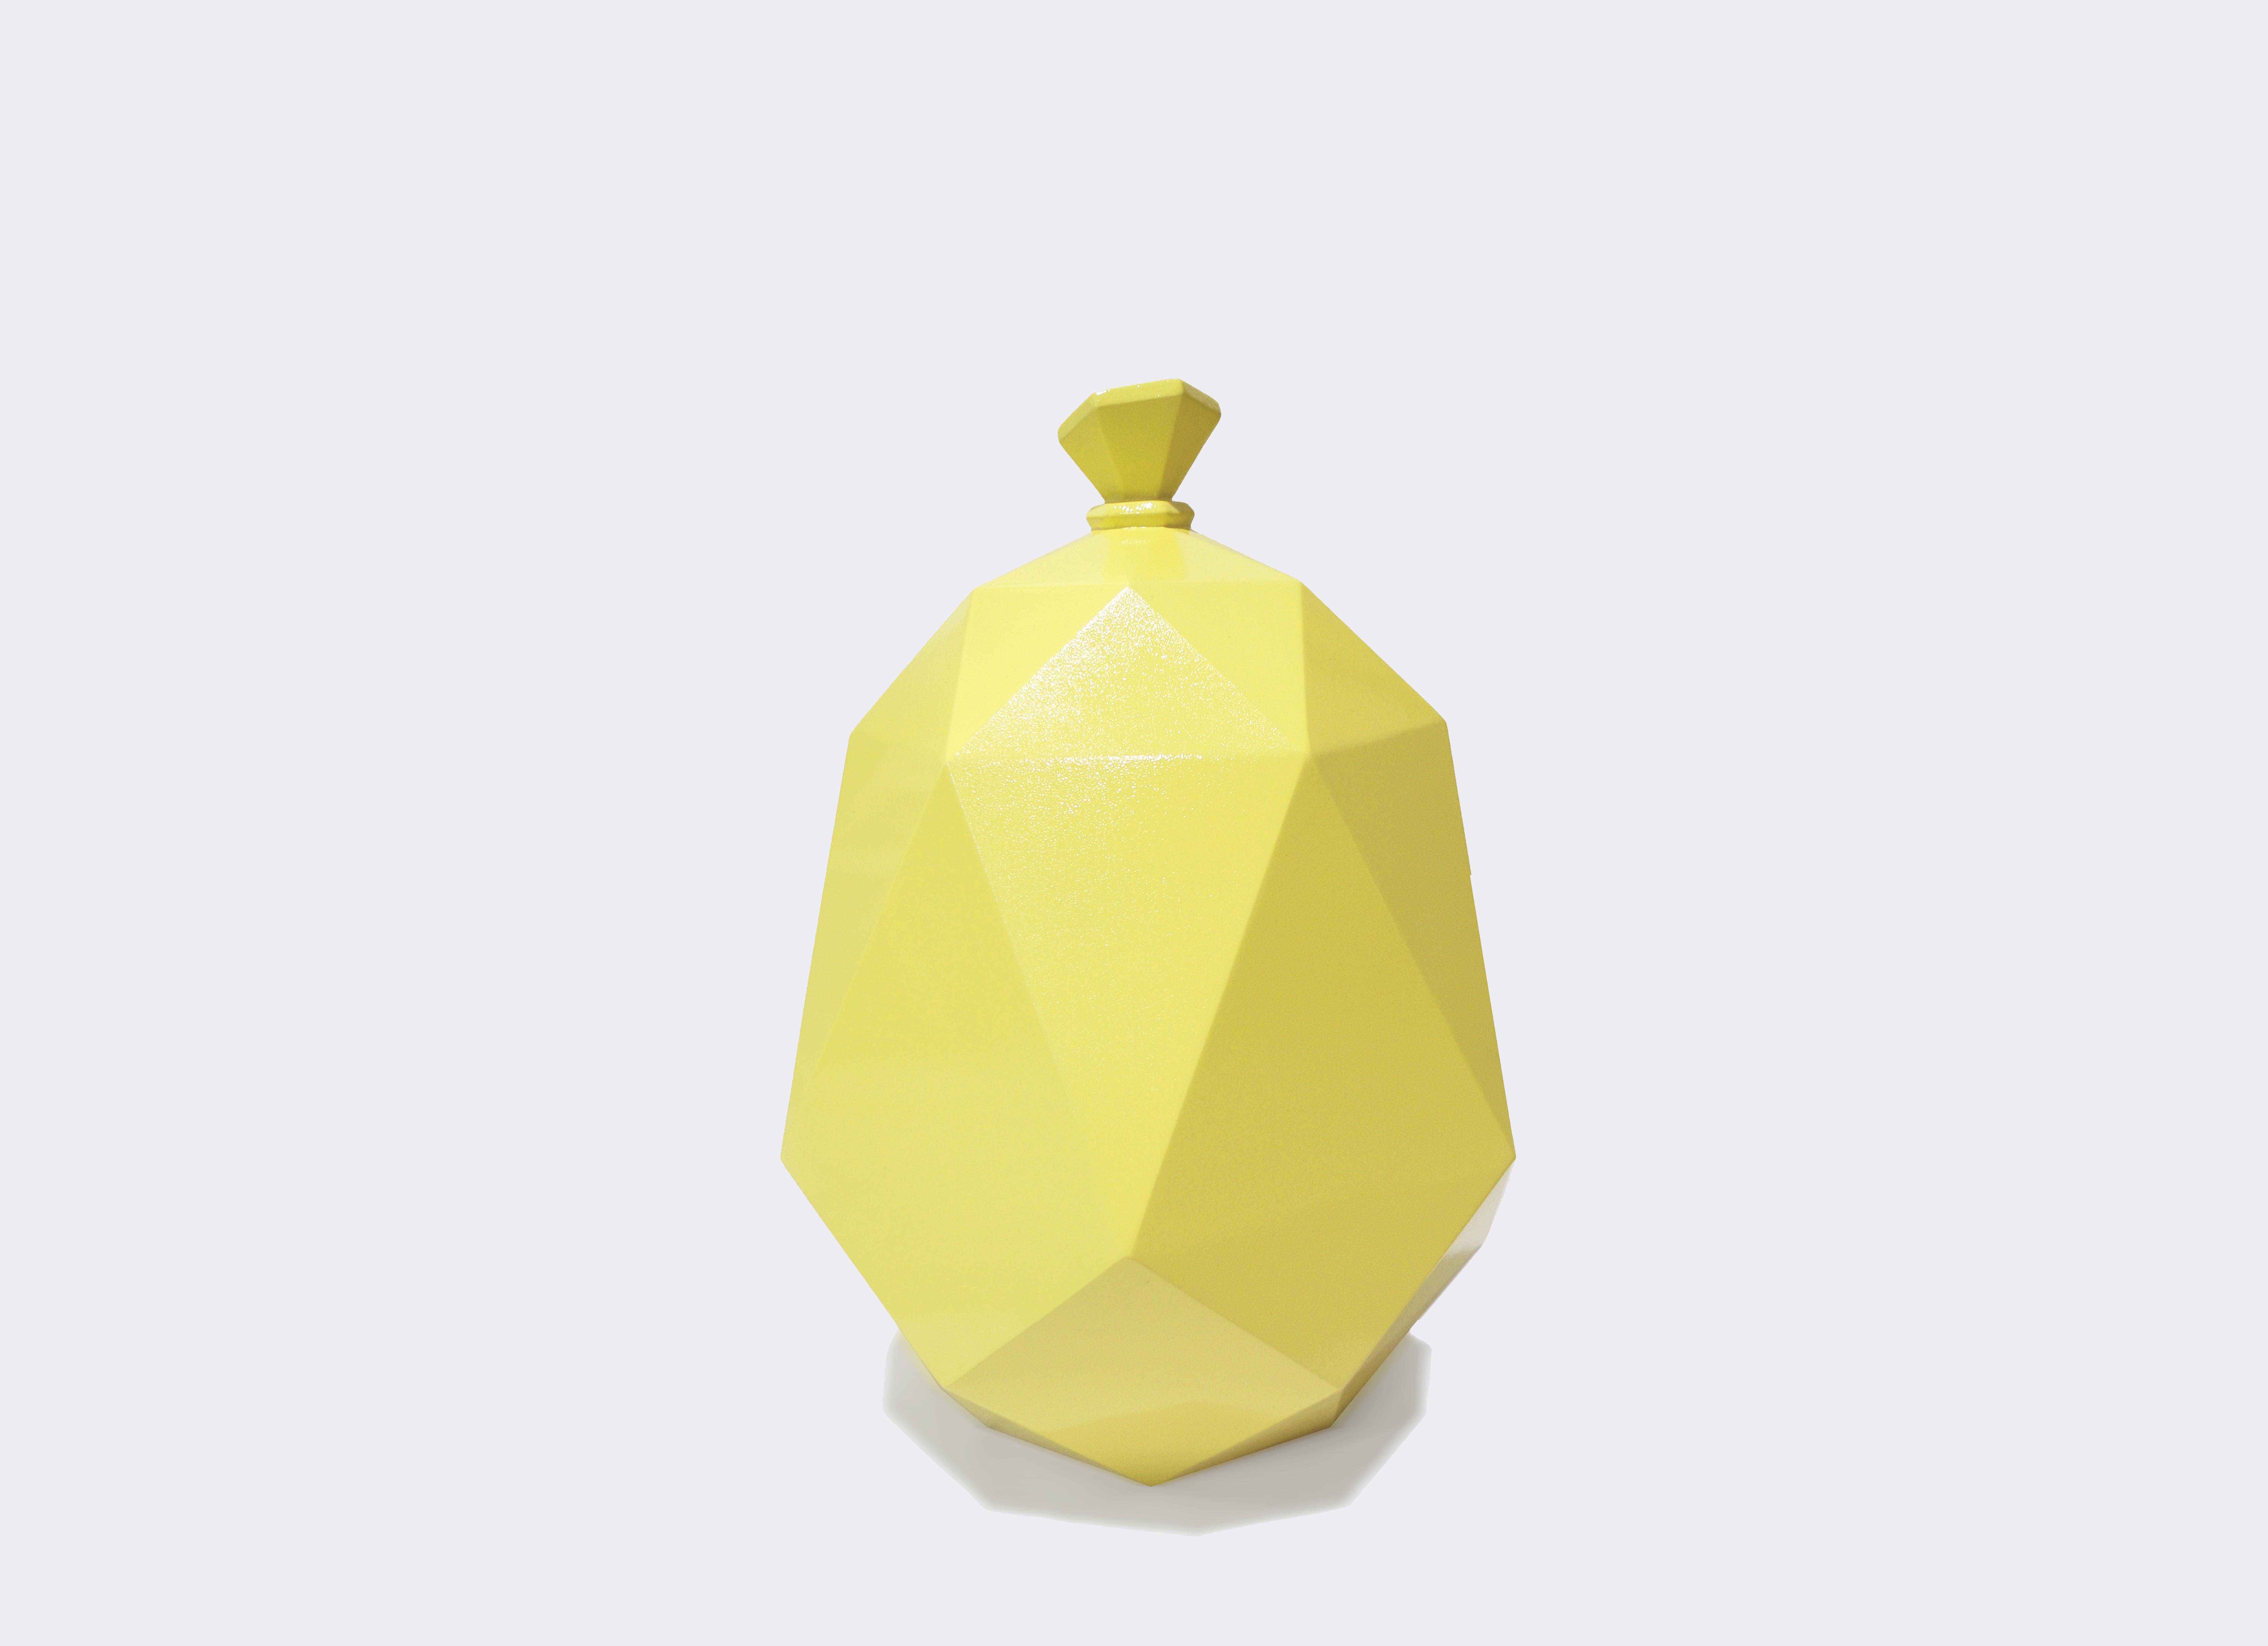 Polygon Balloon - Yellow